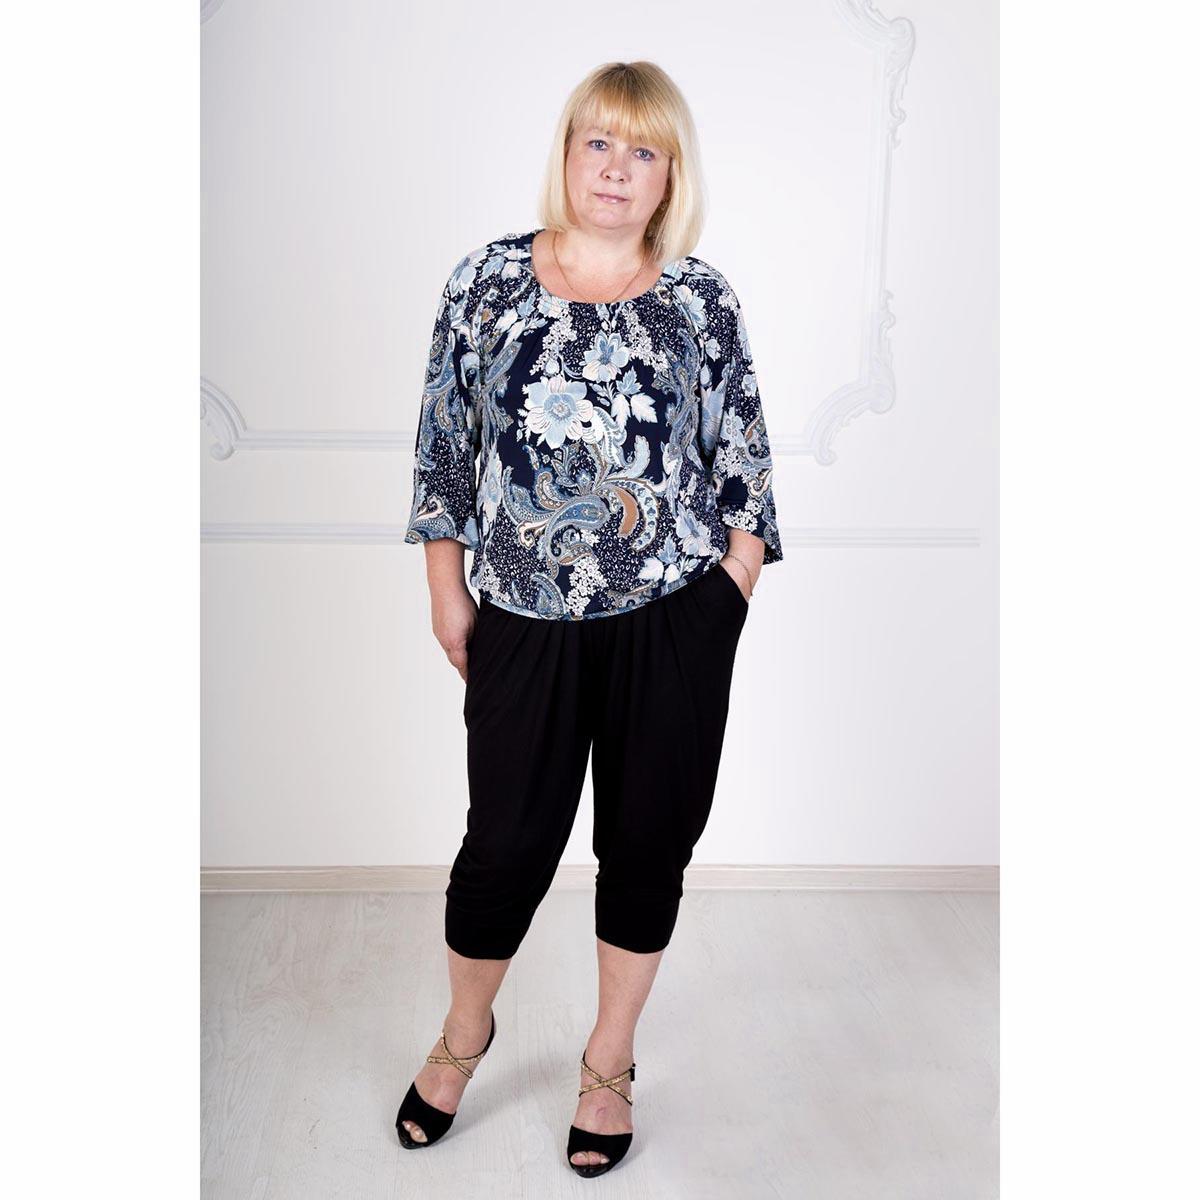 Женская блуза Ильда, размер 52Блузки, майки, кофты<br>Обхват груди:104 см<br>Обхват талии:85 см<br>Обхват бедер:112 см<br>Рост:167 см<br><br>Тип: Жен. блуза<br>Размер: 52<br>Материал: Масло